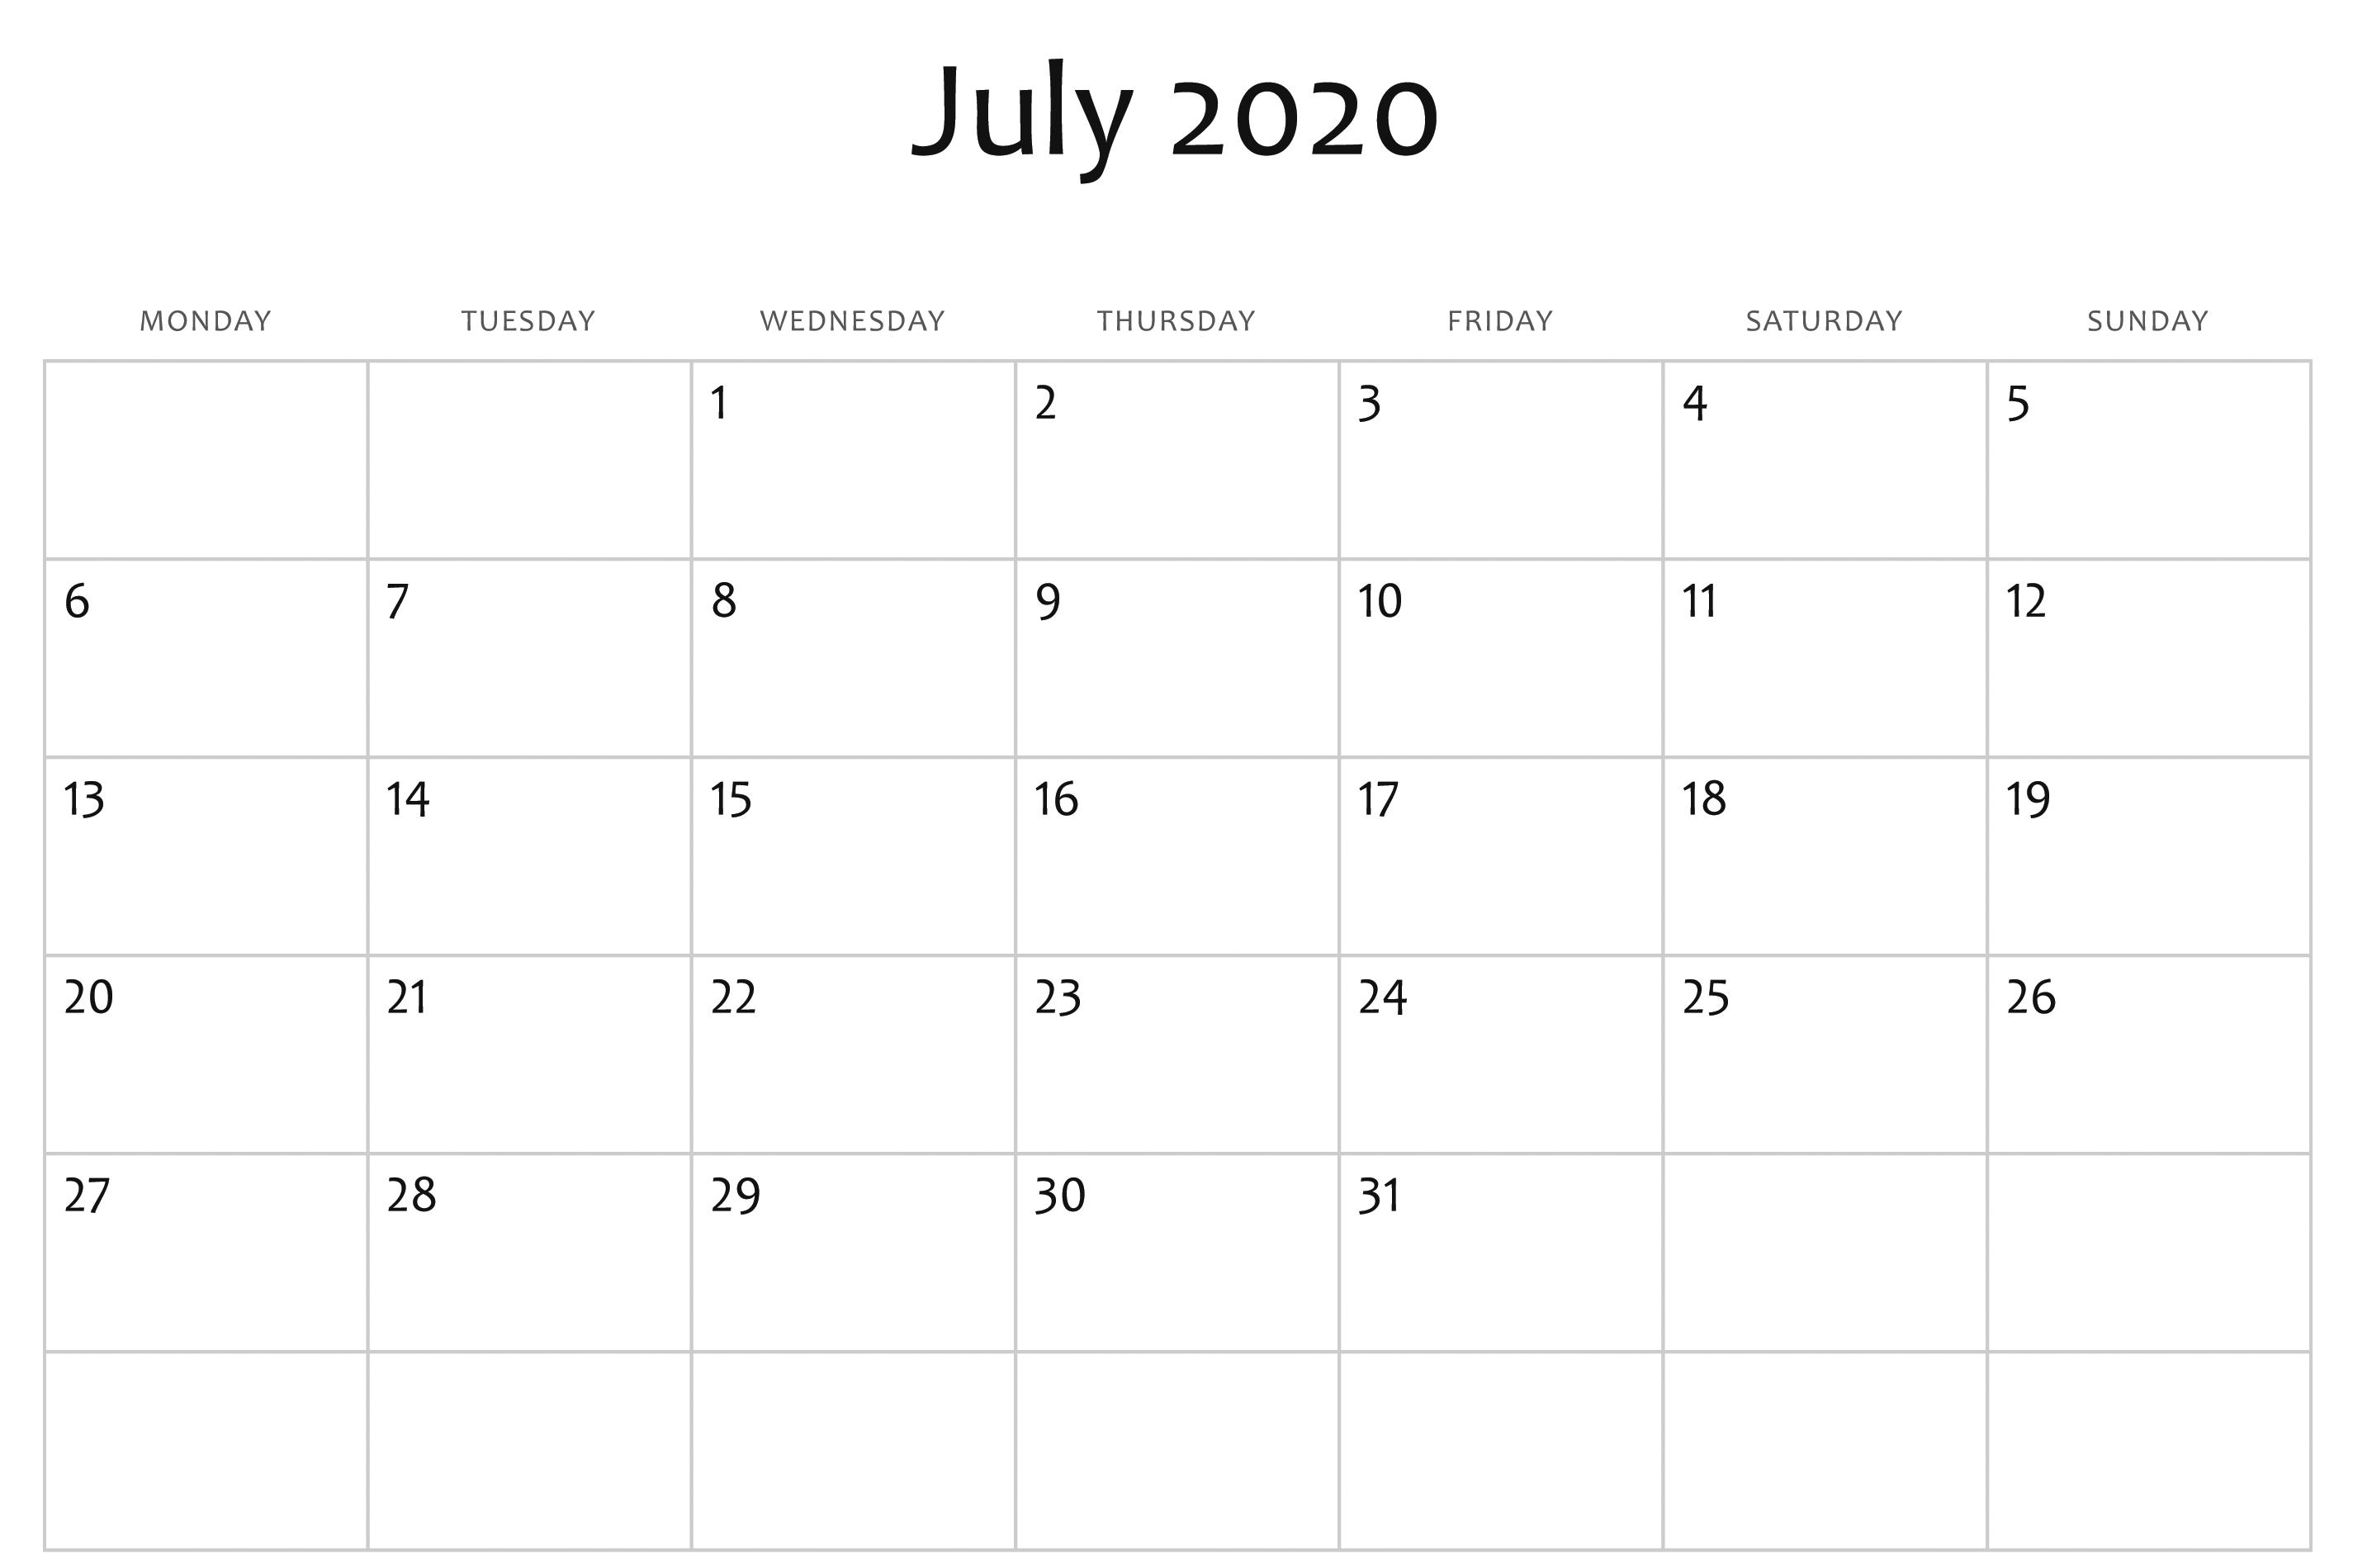 2020 Calendar Word Template - Wpa.wpart.co-Free Microsoft Word Calendar Template 2020